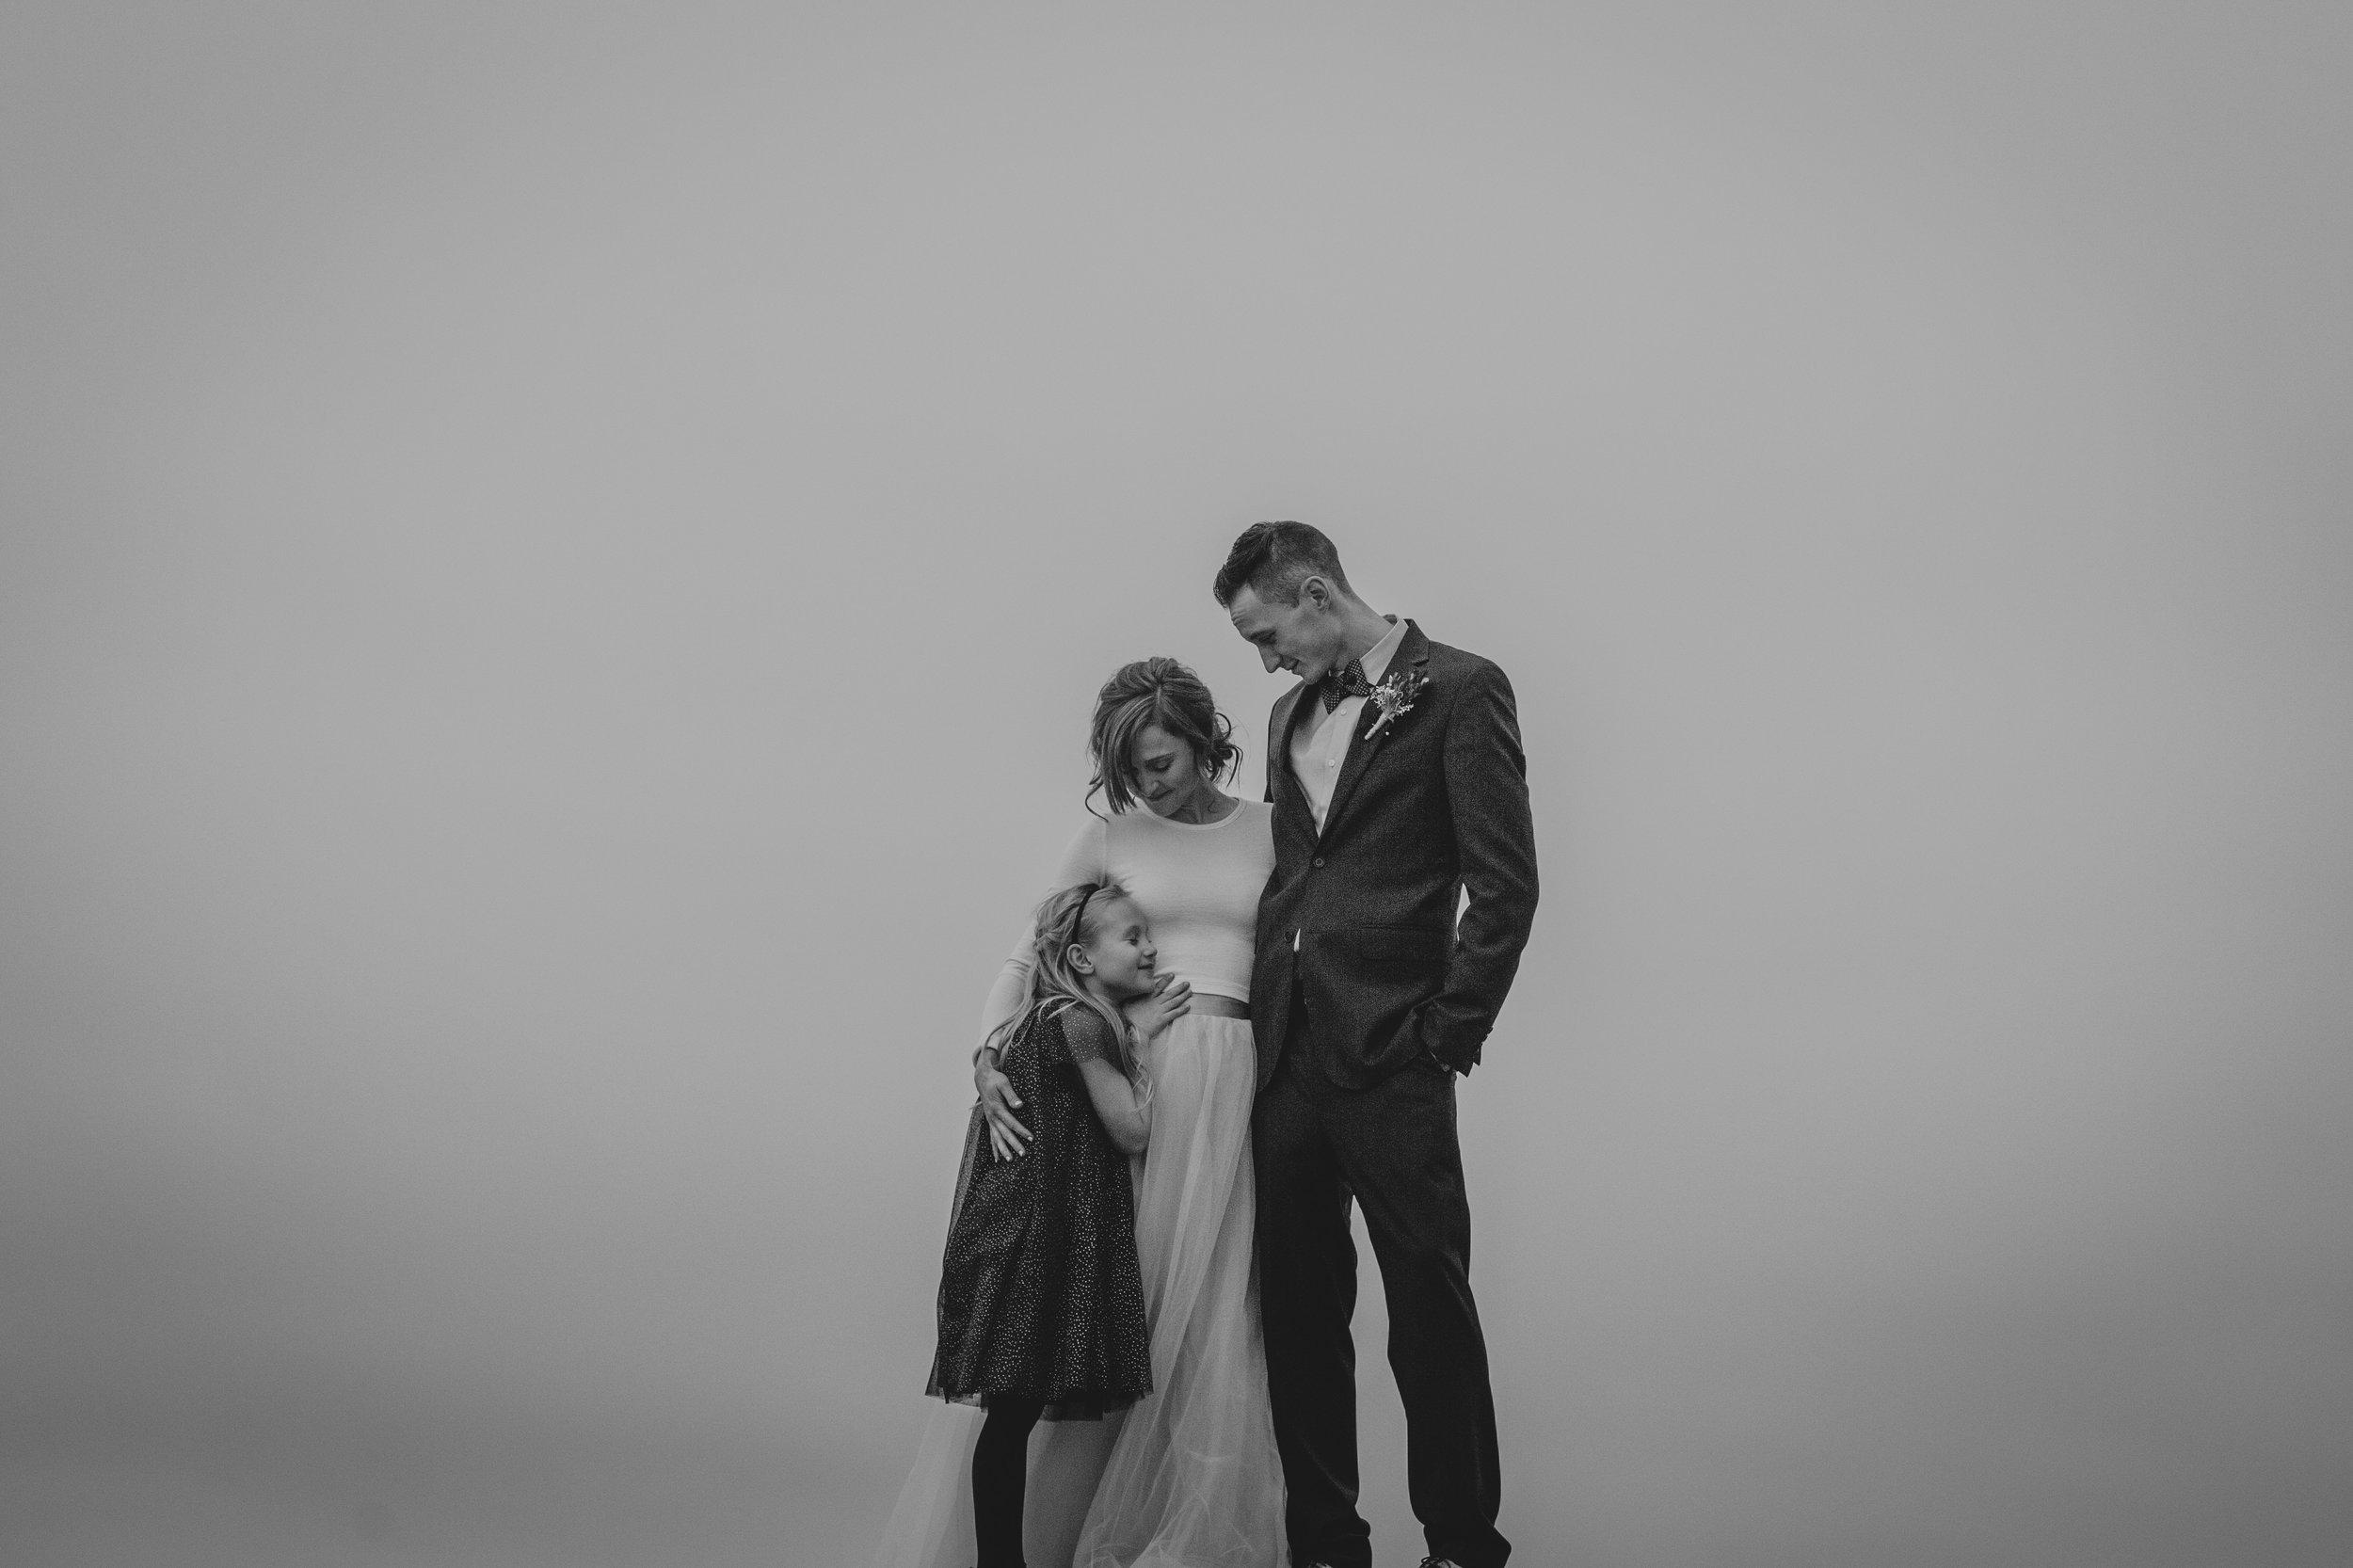 bridal portraits249.jpg